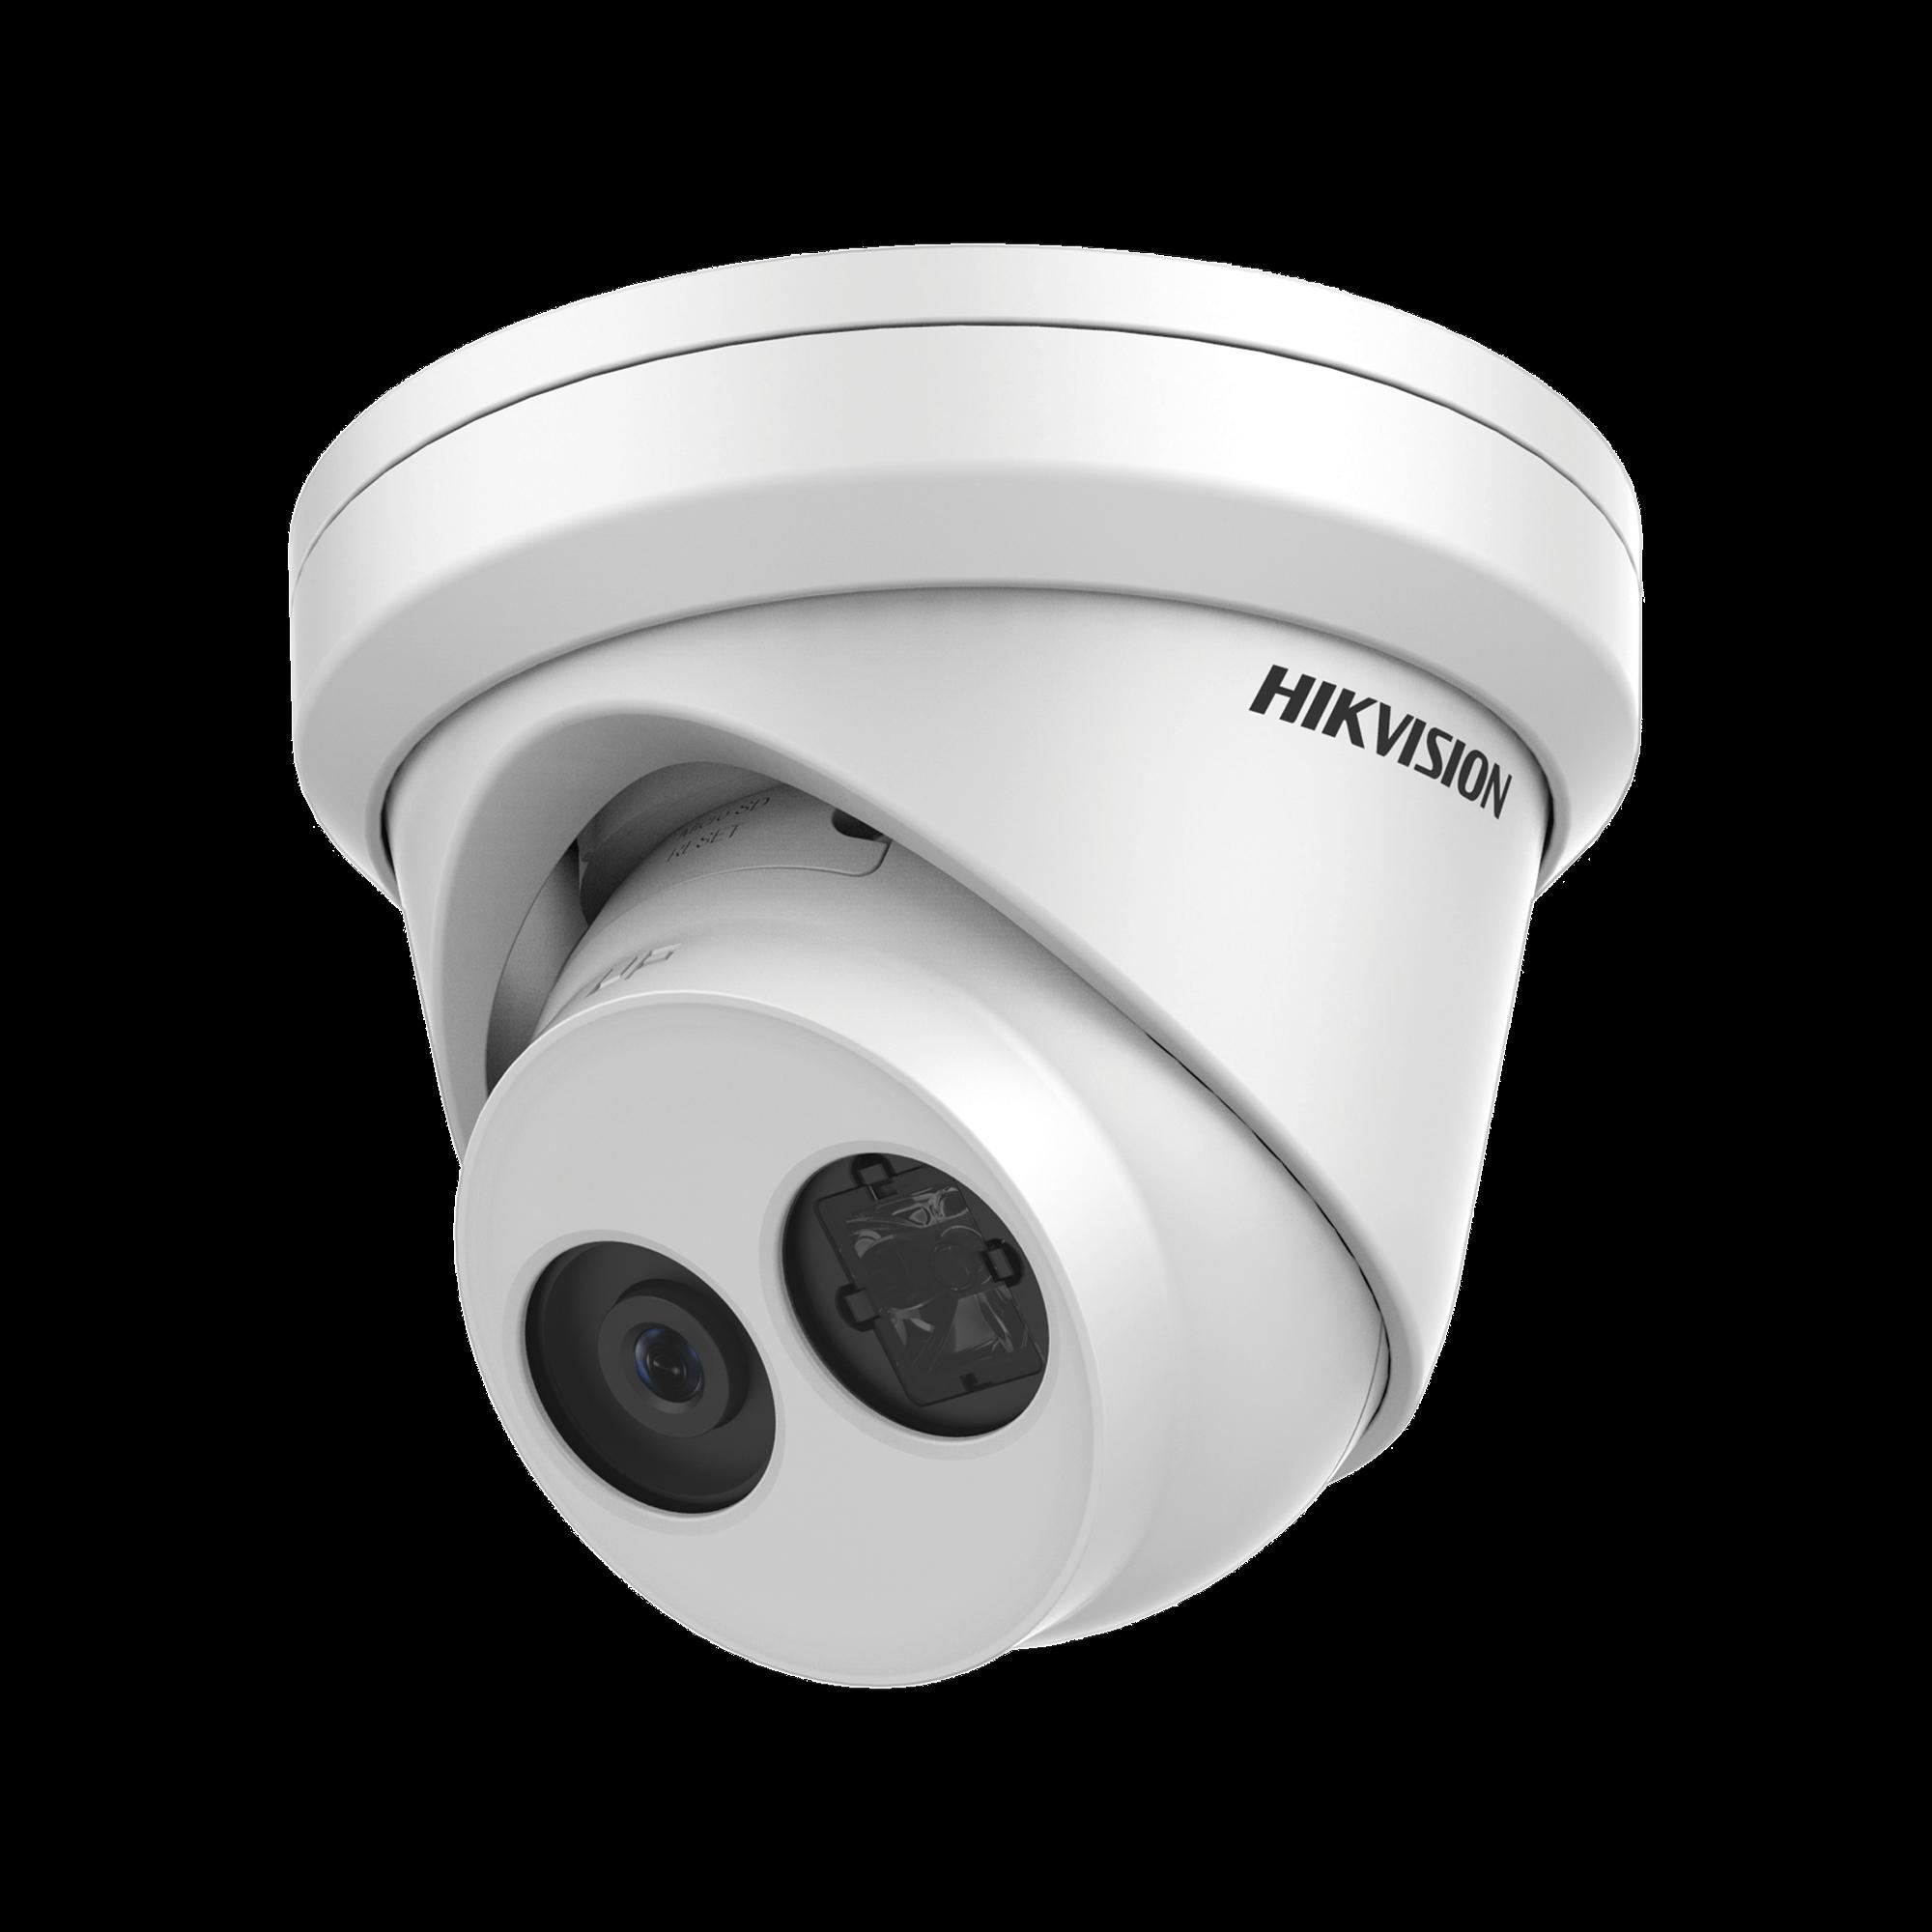 Turret IP 4 Megapixel / Serie PRO /  30 mts IR EXIR / Exterior IP66 / WDR 120 dB / PoE / Lente 2.8 mm / Videoanaliticos Integrados / Micrófono Integrado